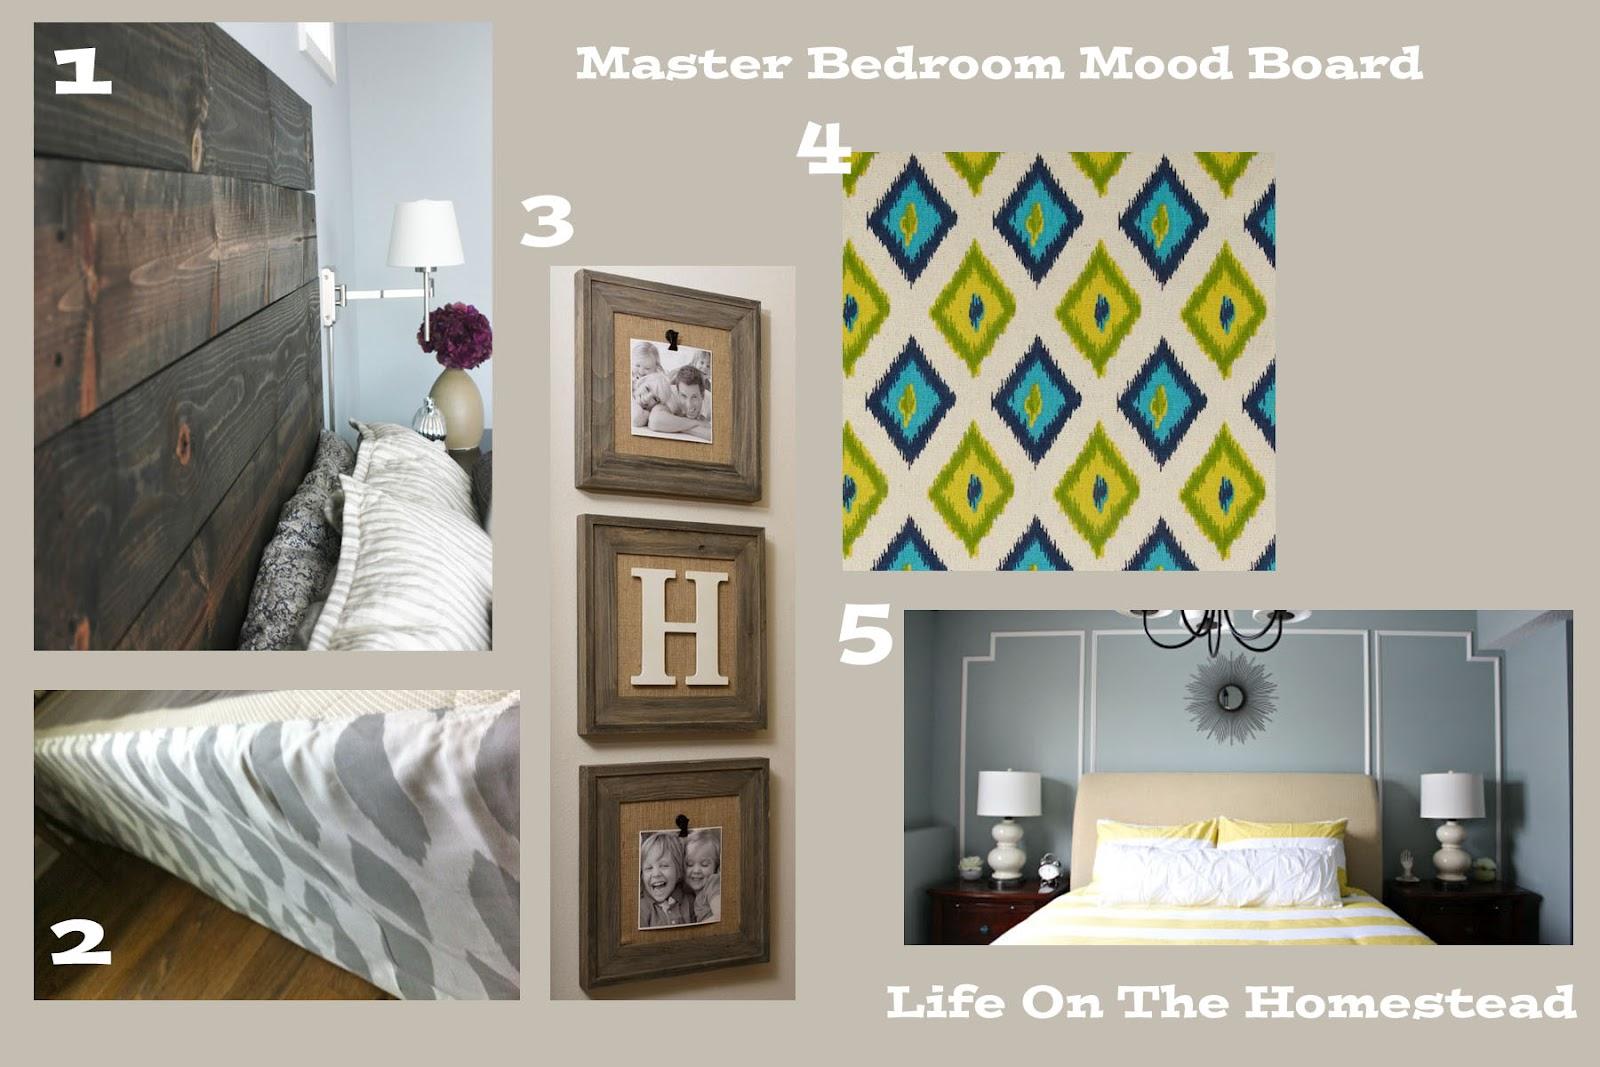 Life On The Homestead A Master Bedroom Mood Board